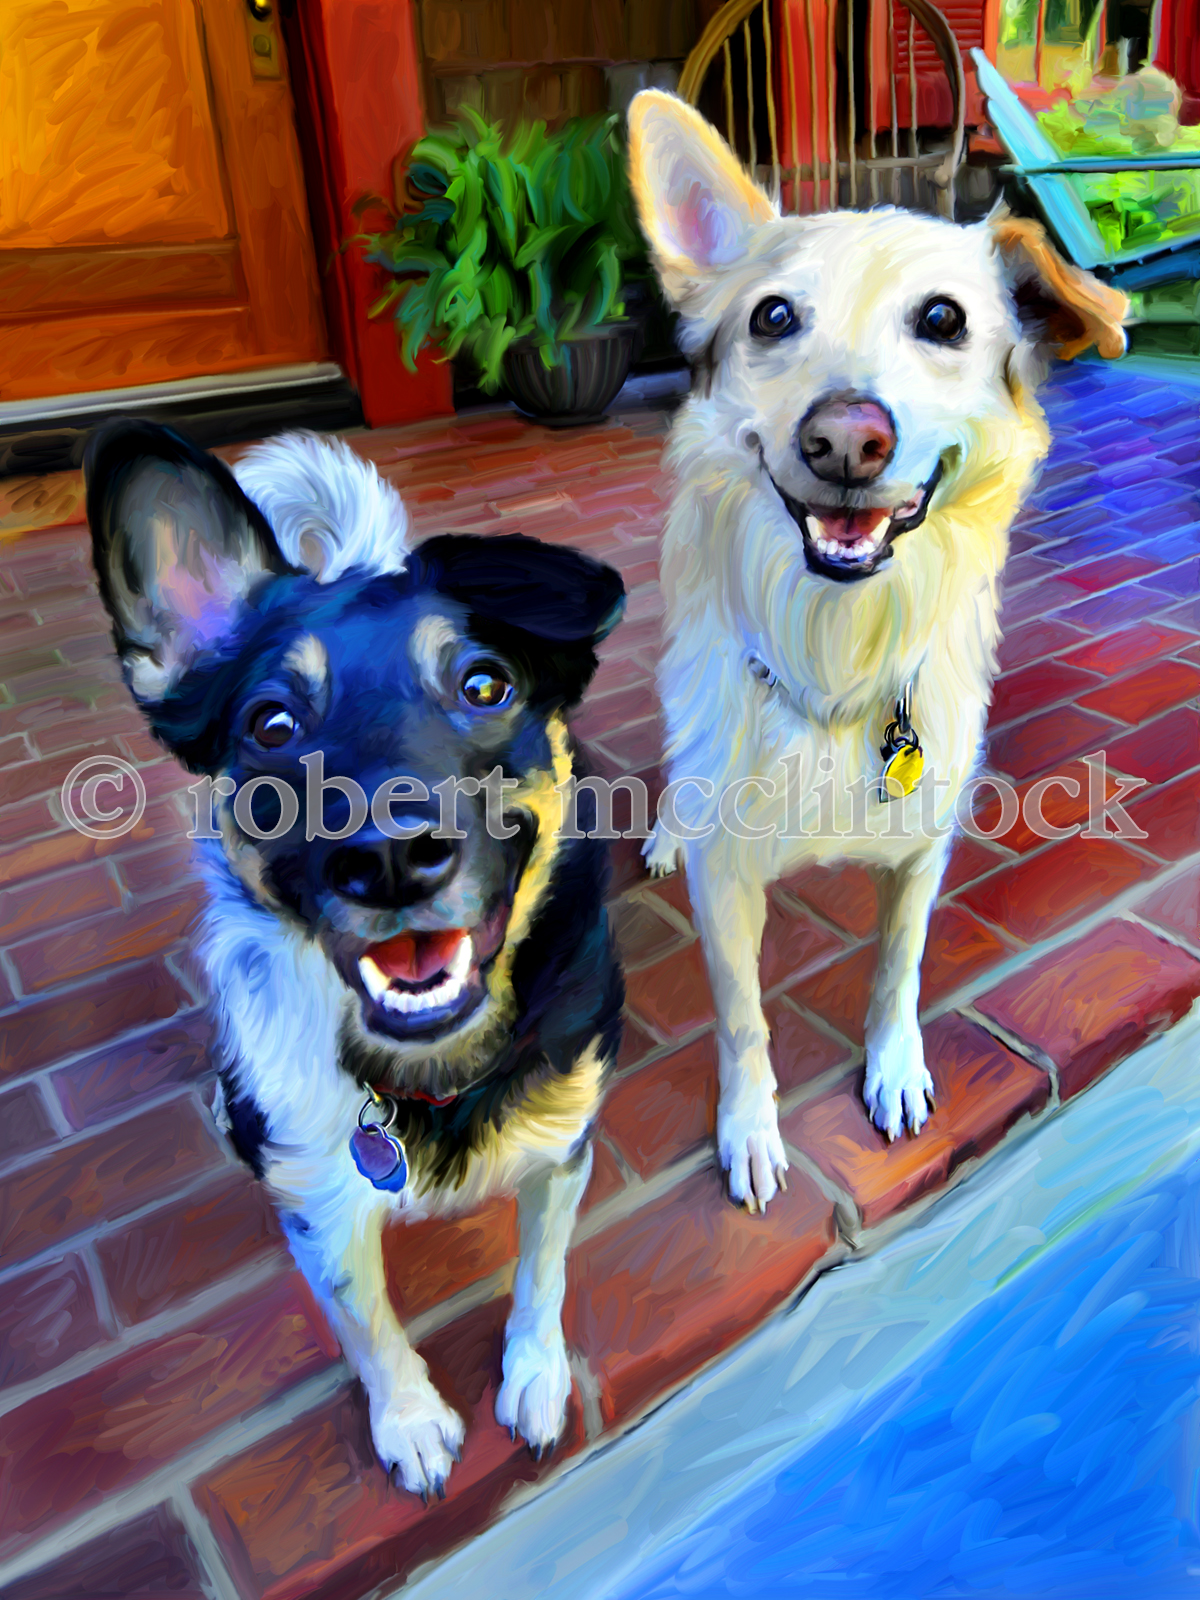 ciaverelli-dogs-1448v5.jpg